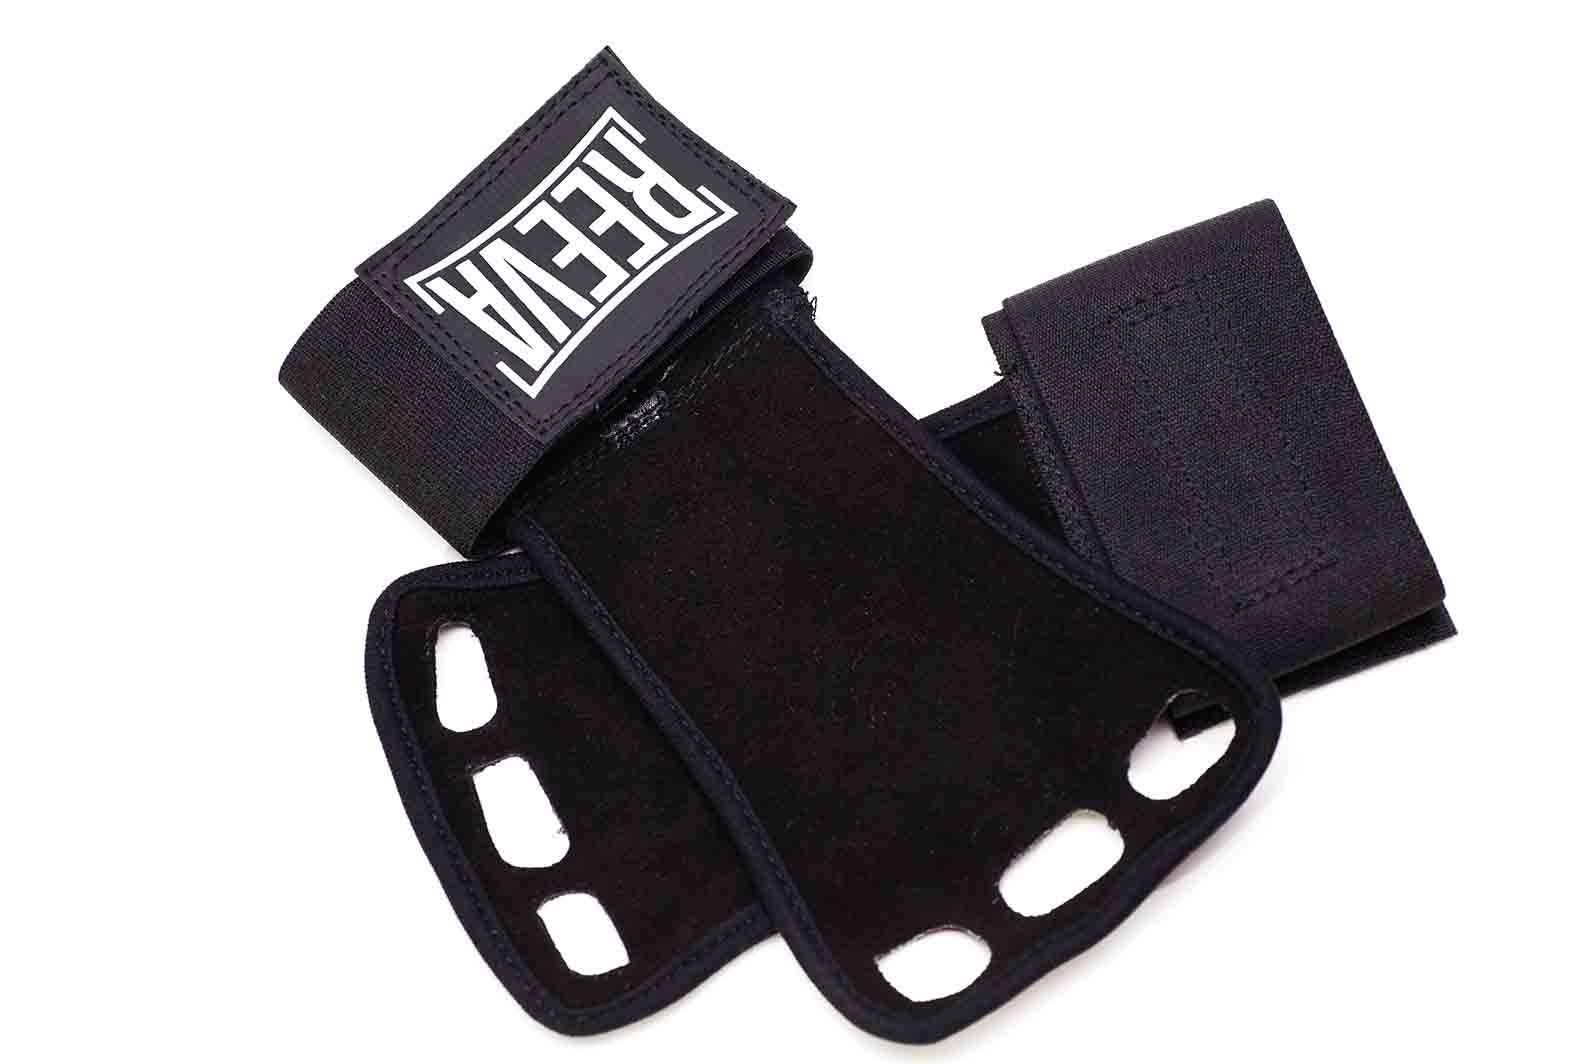 45ff1c2b9f4 Reeva Crossfit Leather Grips | crossfit - gear | Pinterest - Showrooms